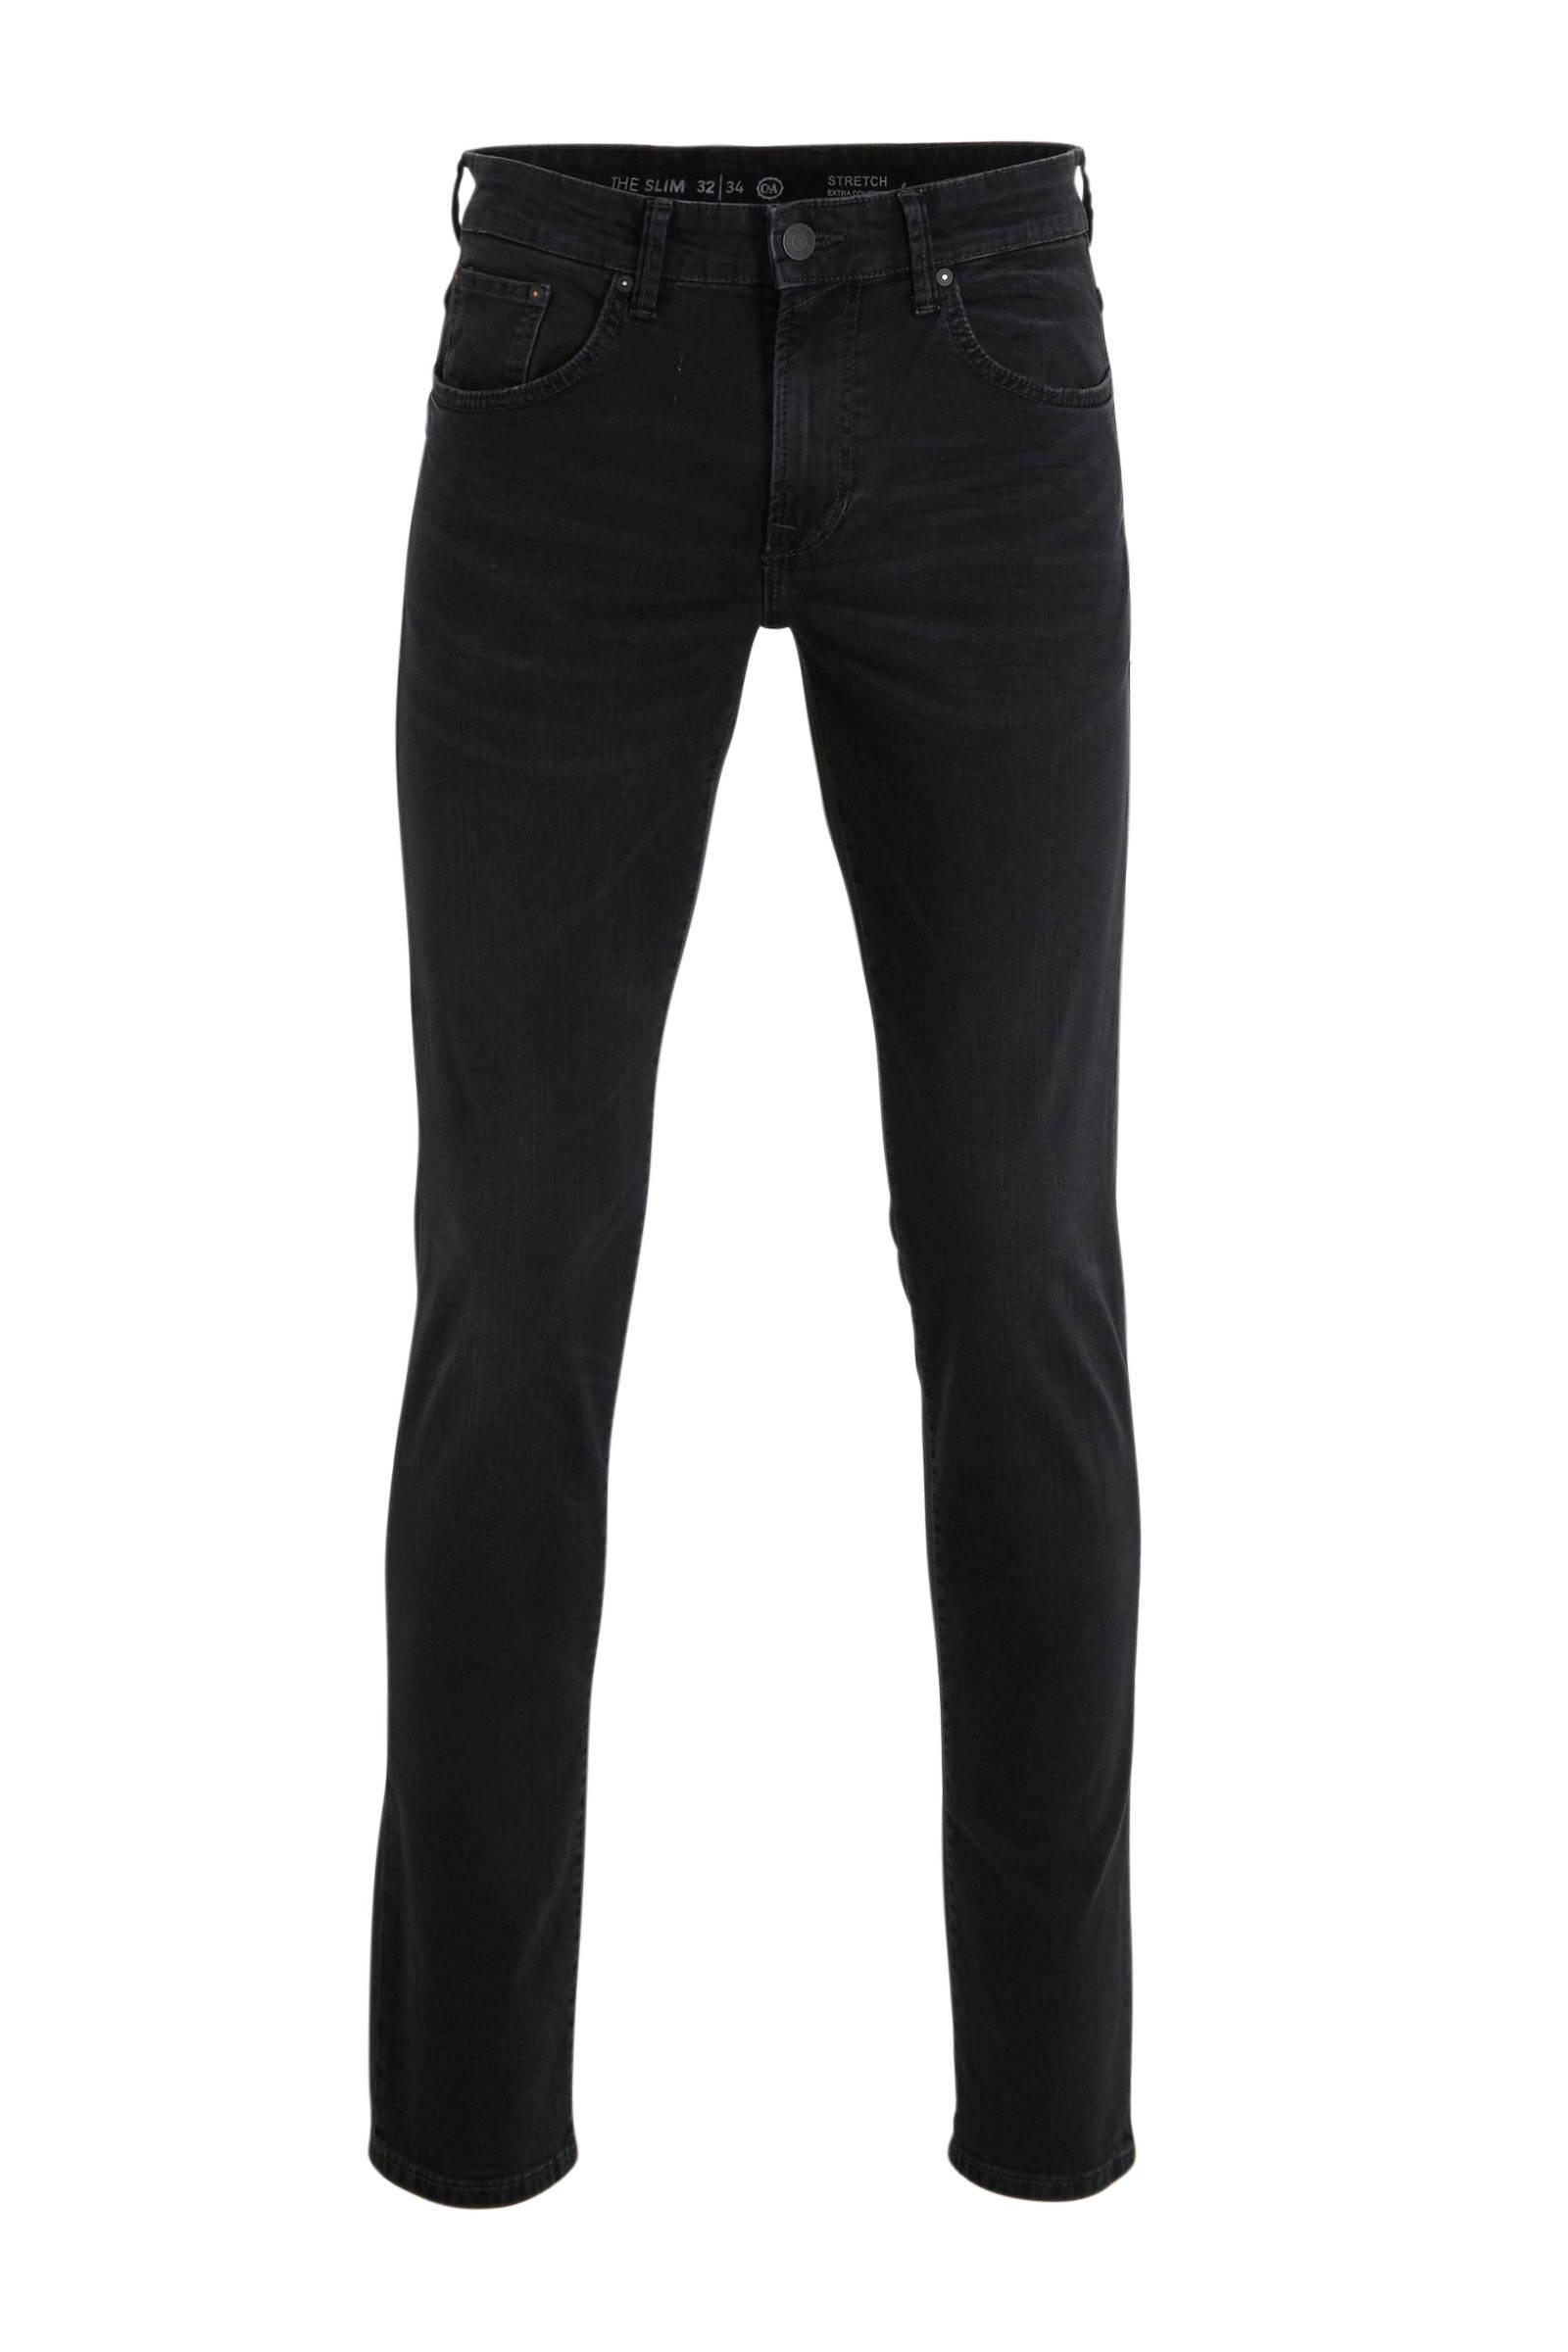 C&A The Denim straight fit jeans dark denim Donkere denim